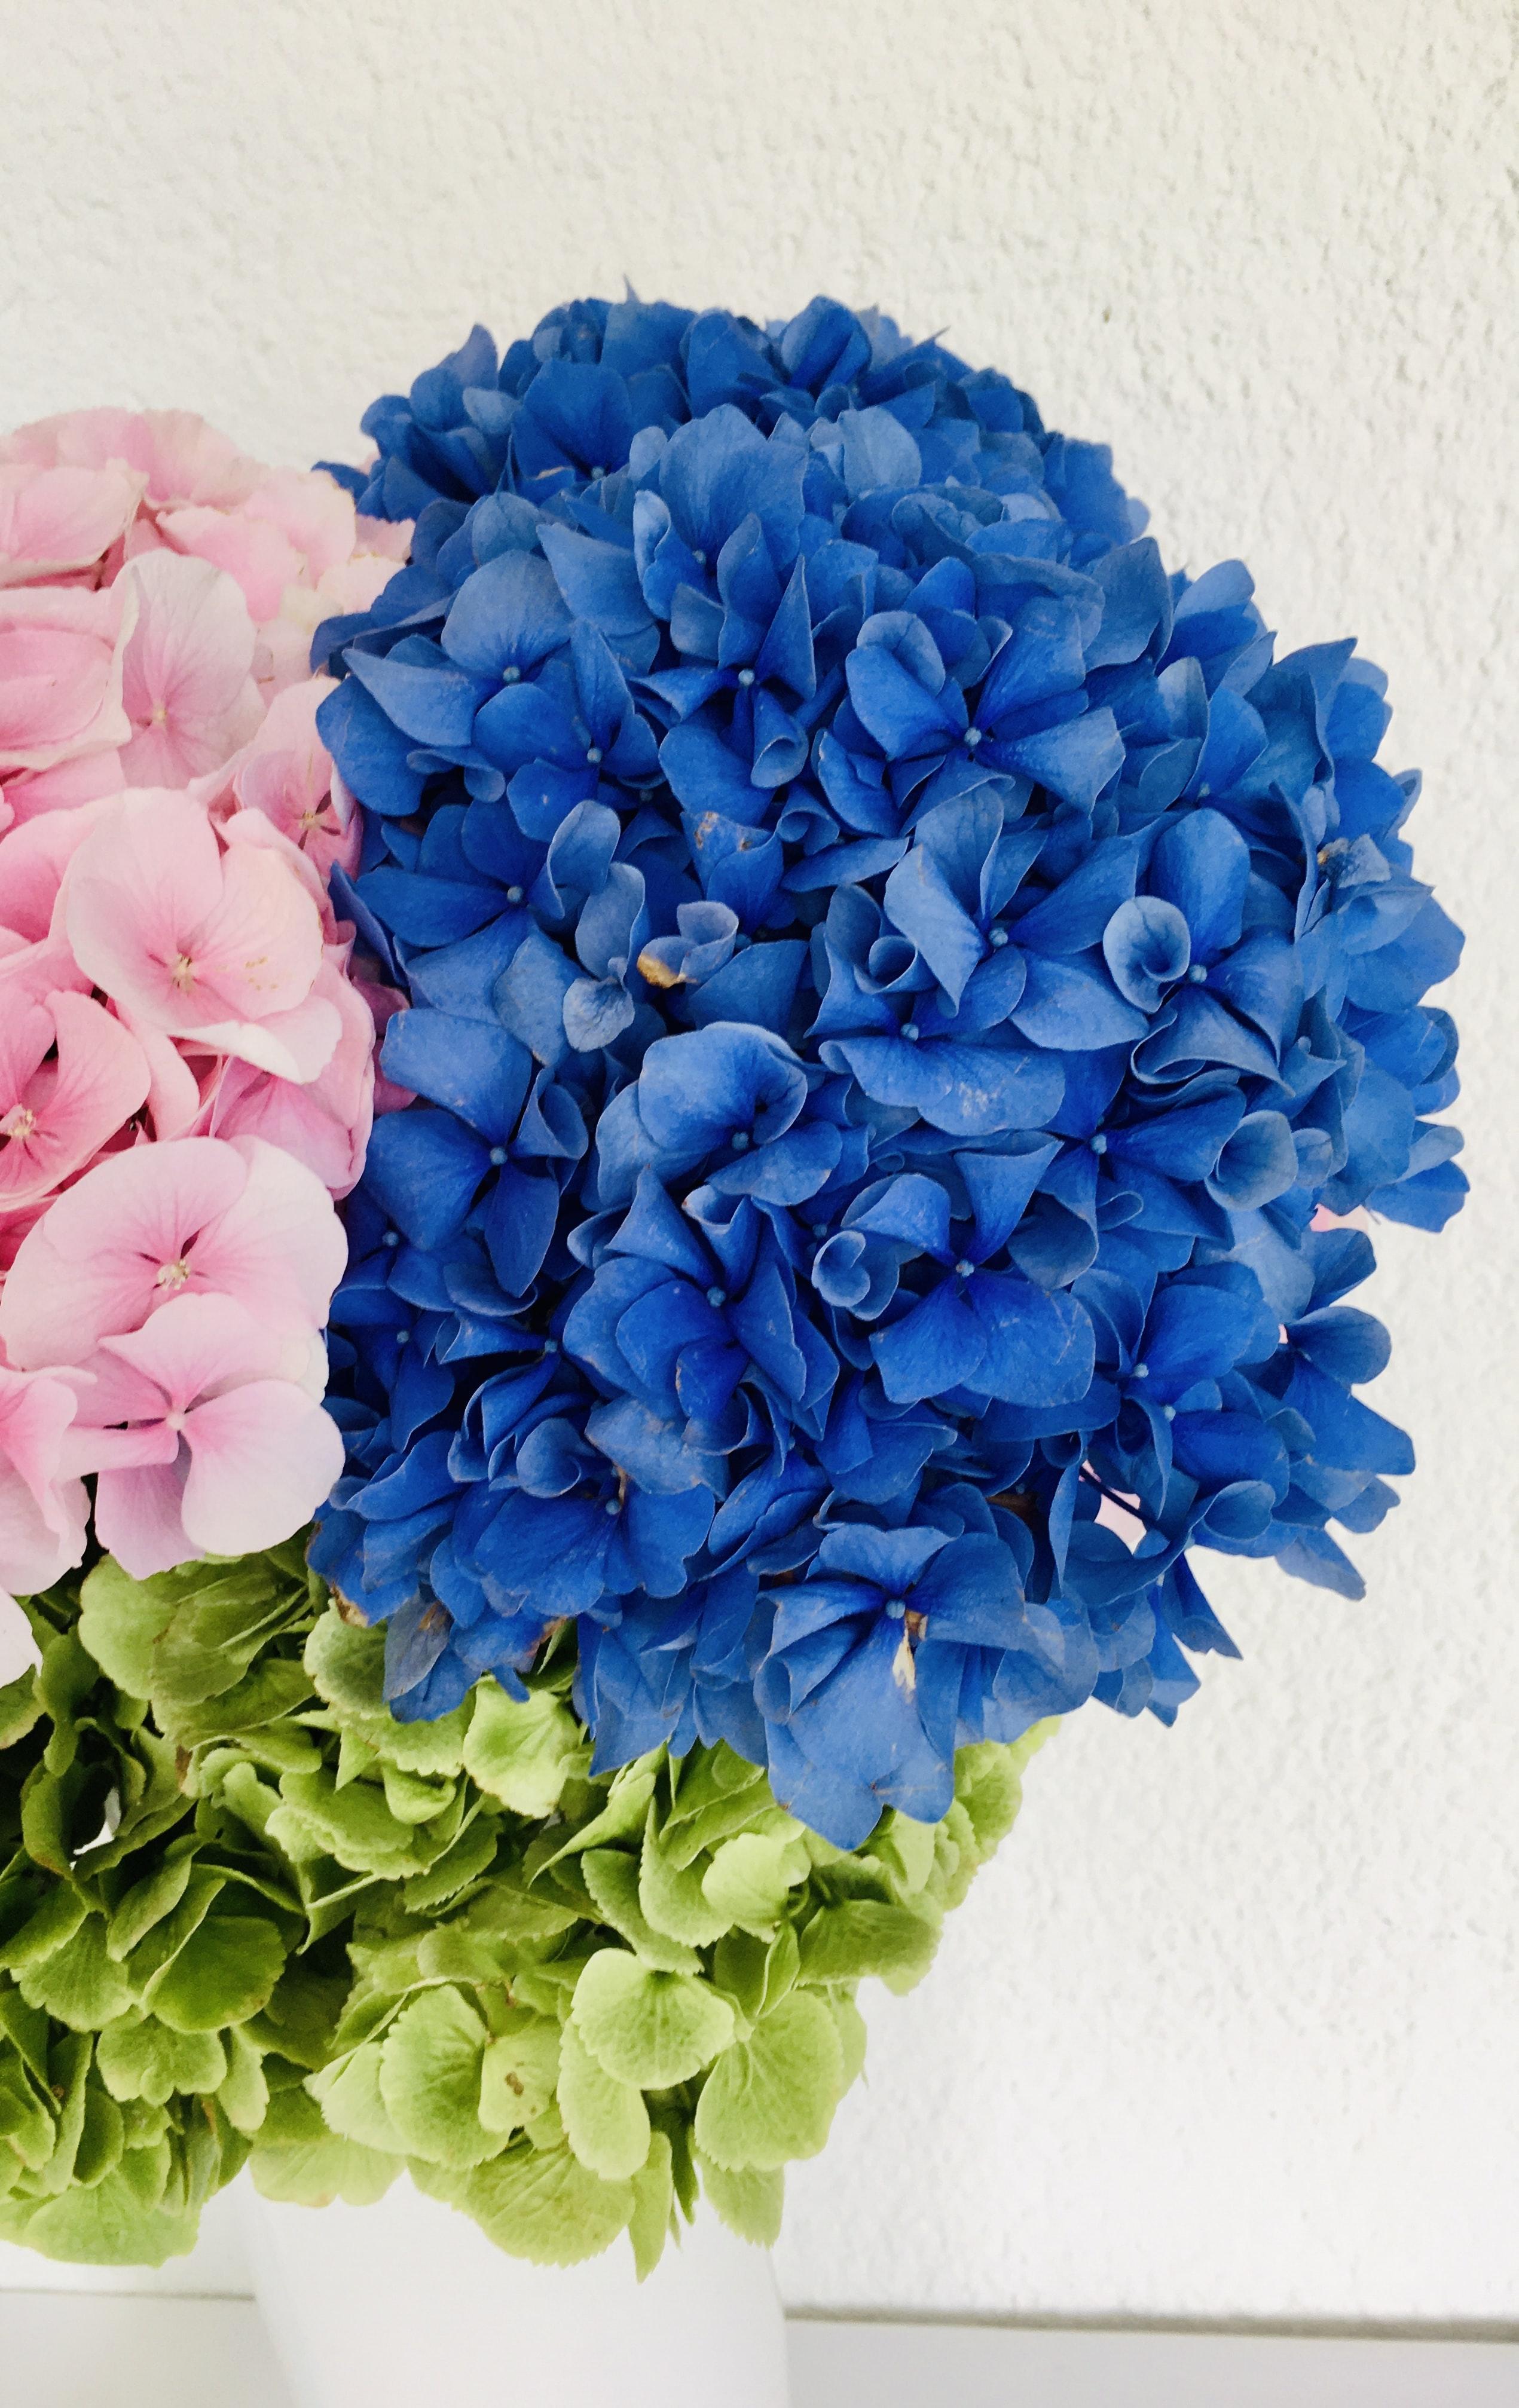 Blue Flower Bouquet On White Table Photo Free Flower Image On Unsplash